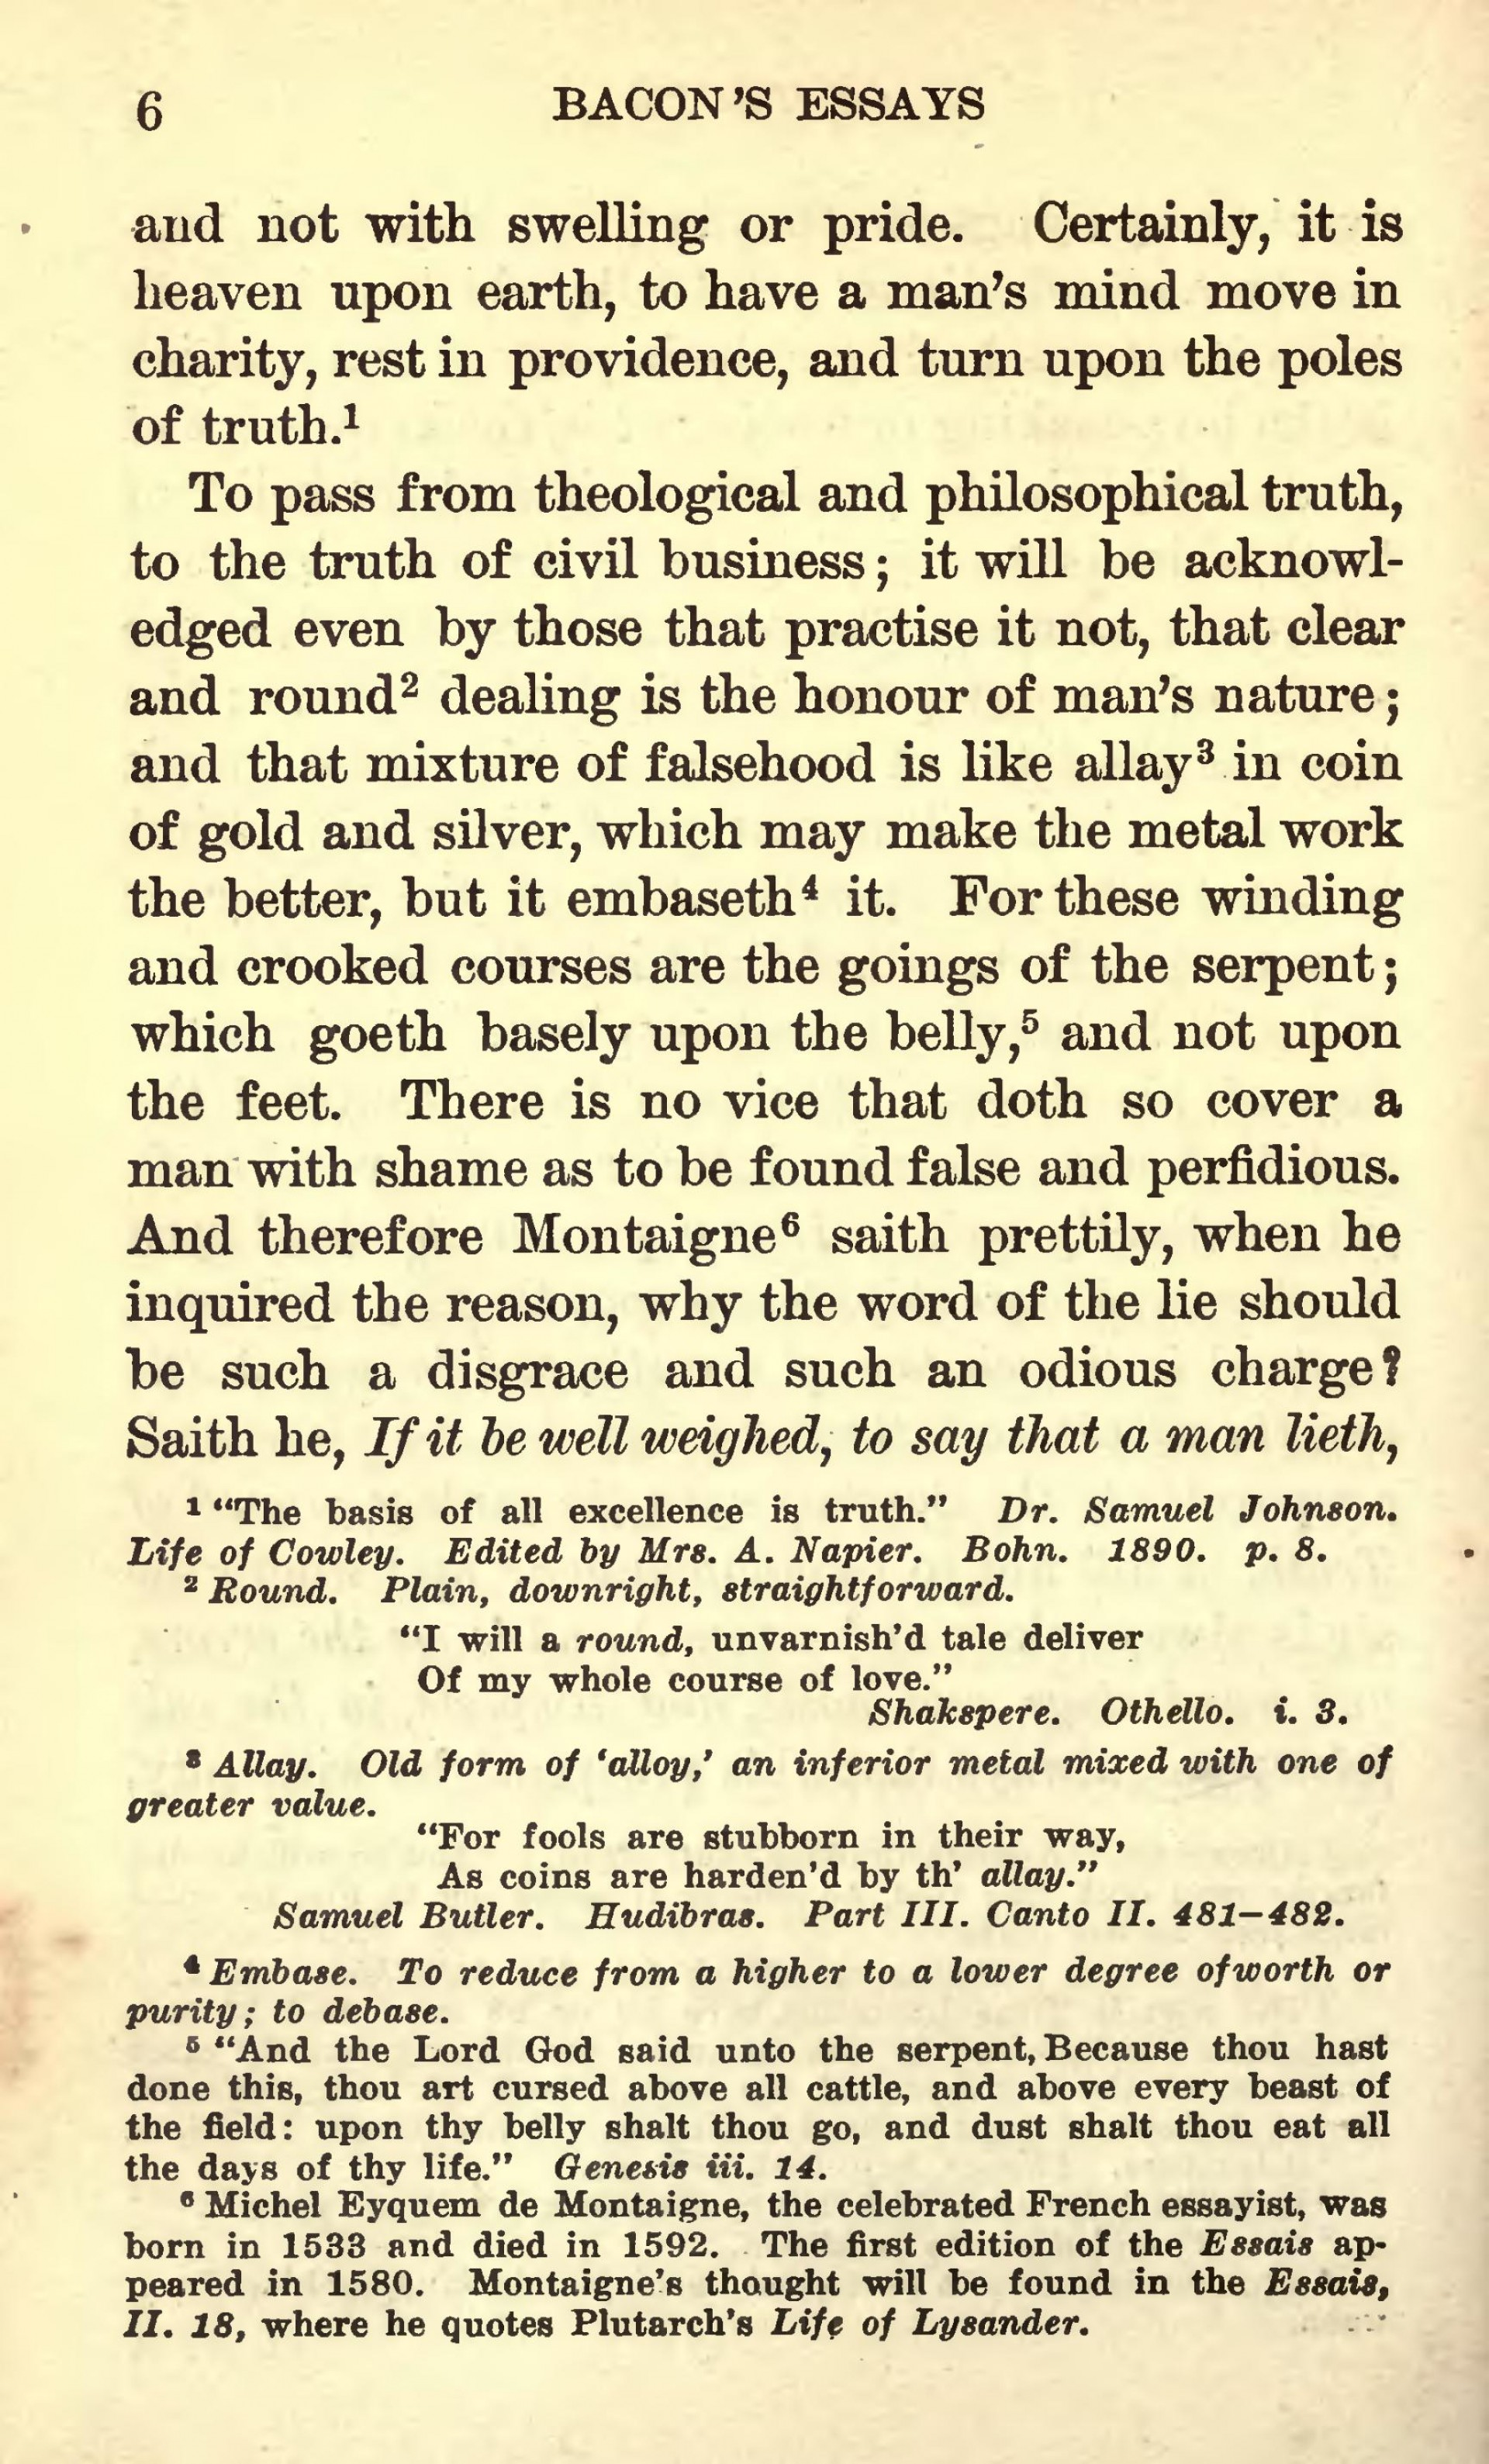 009 Page116 1728px Of Francis Bacon 1908 Scott Djvu Essay Example Bacons Amazing Essays Google Books Truth Quiz Bacon's Summary 1920